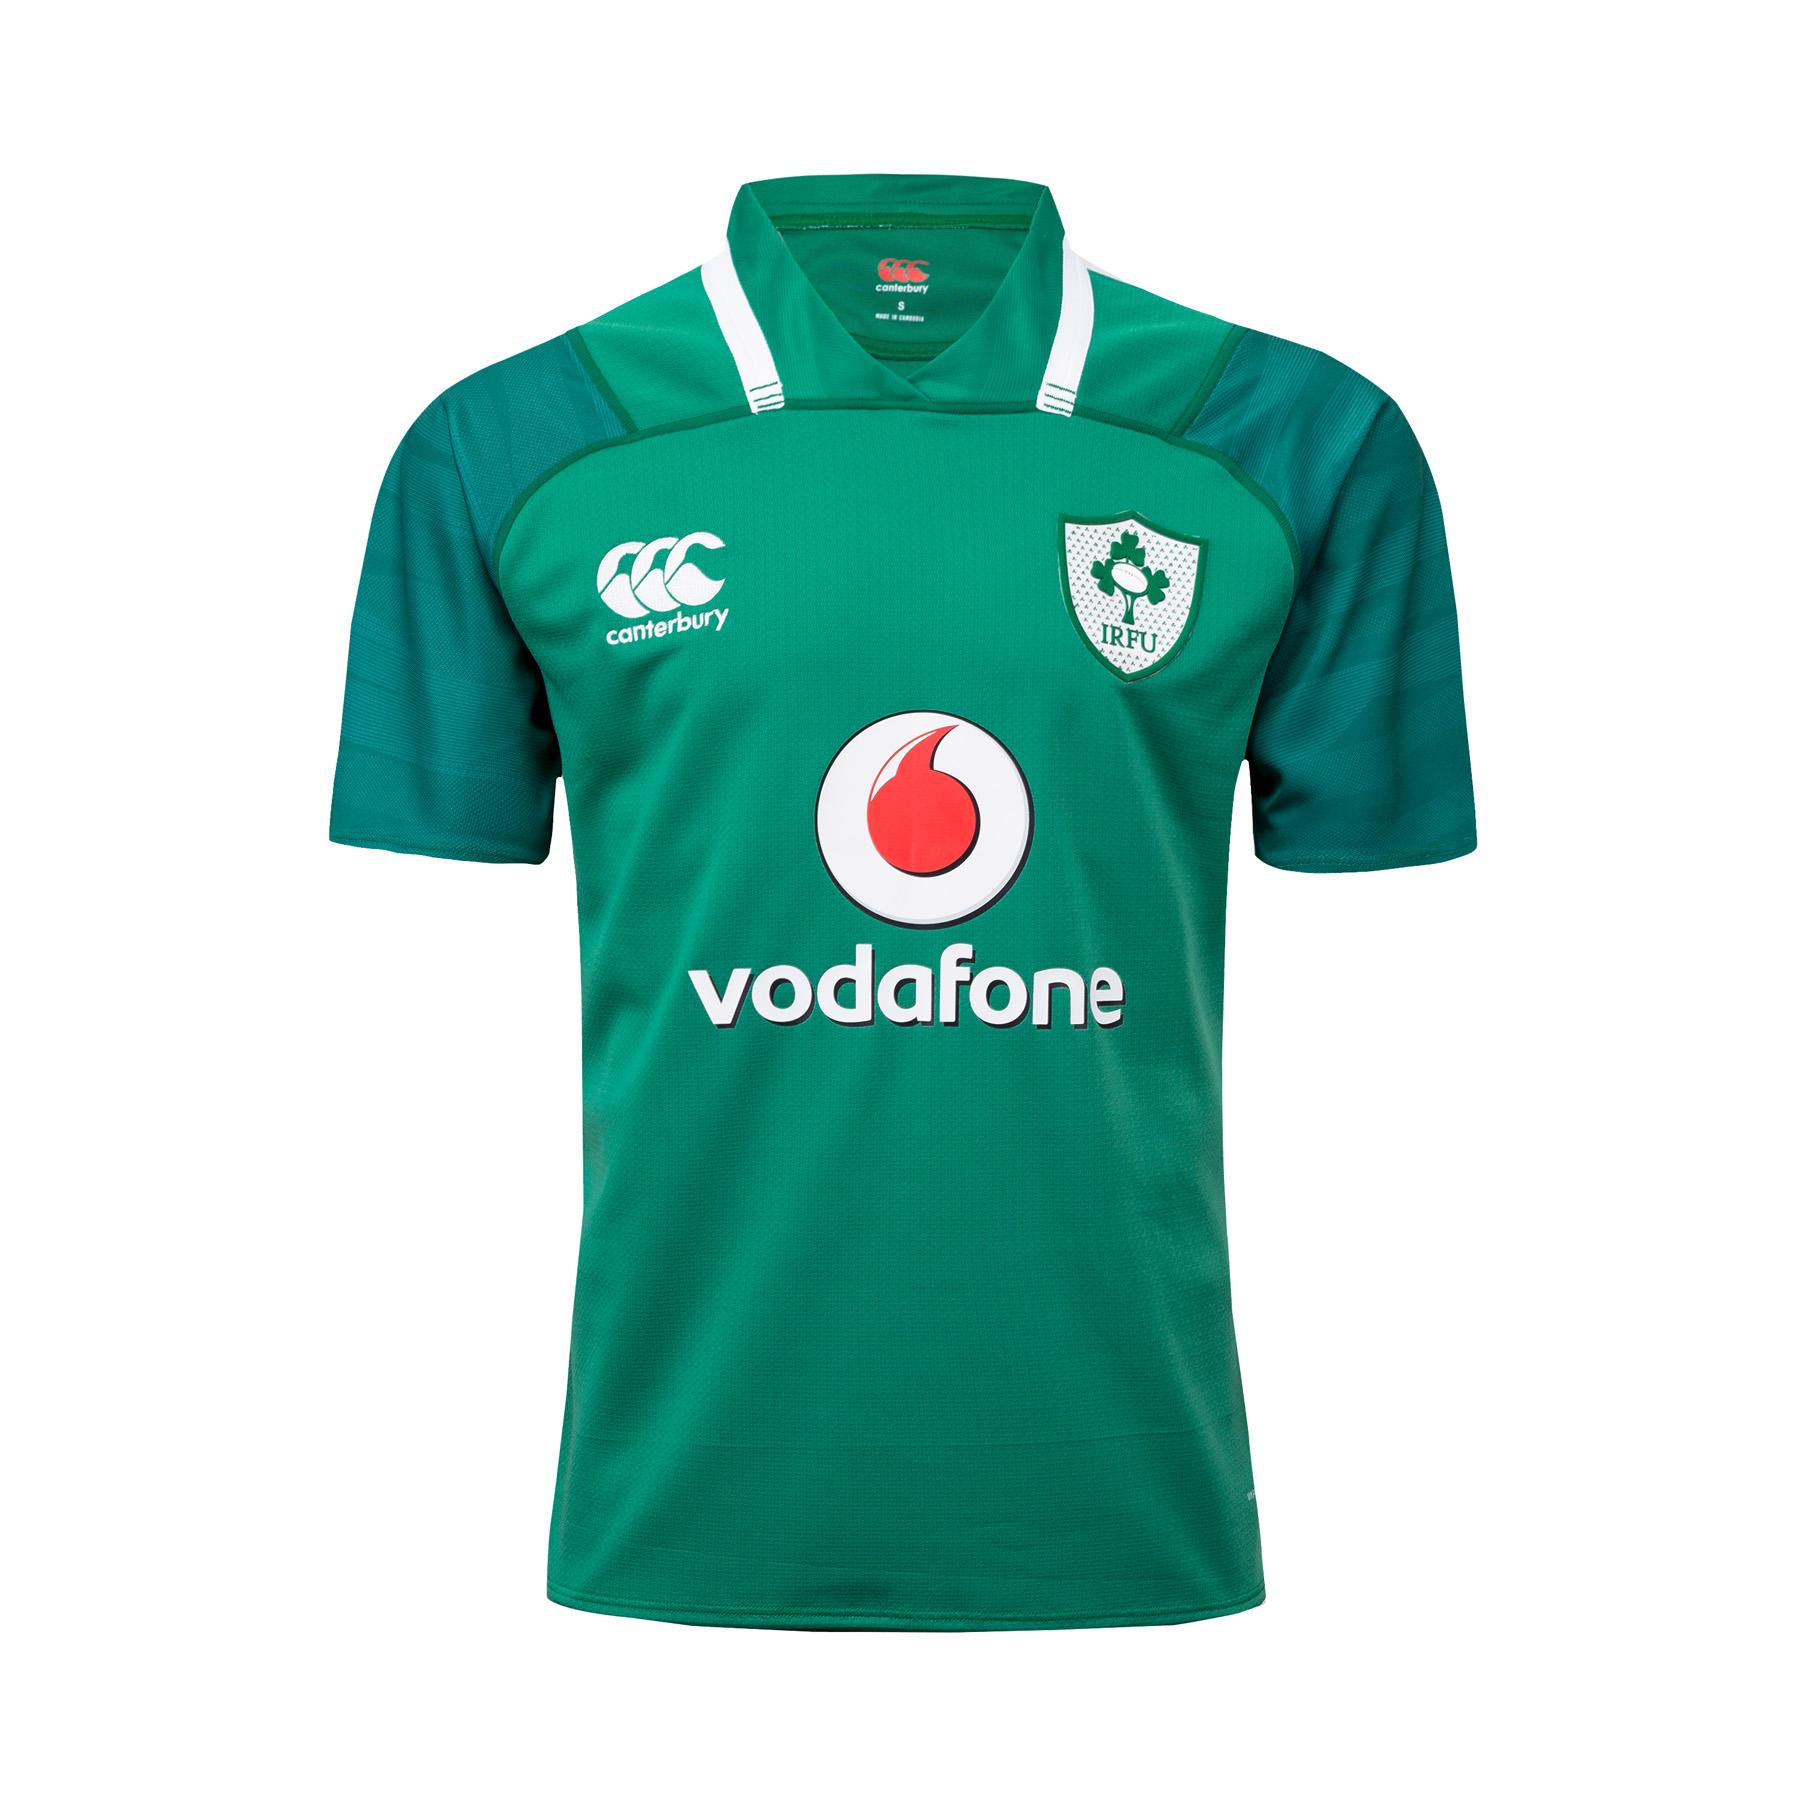 Ирландия регби одежда 2018-17 ирландия зеленый регби одежда Ireland Rugby Jerseys